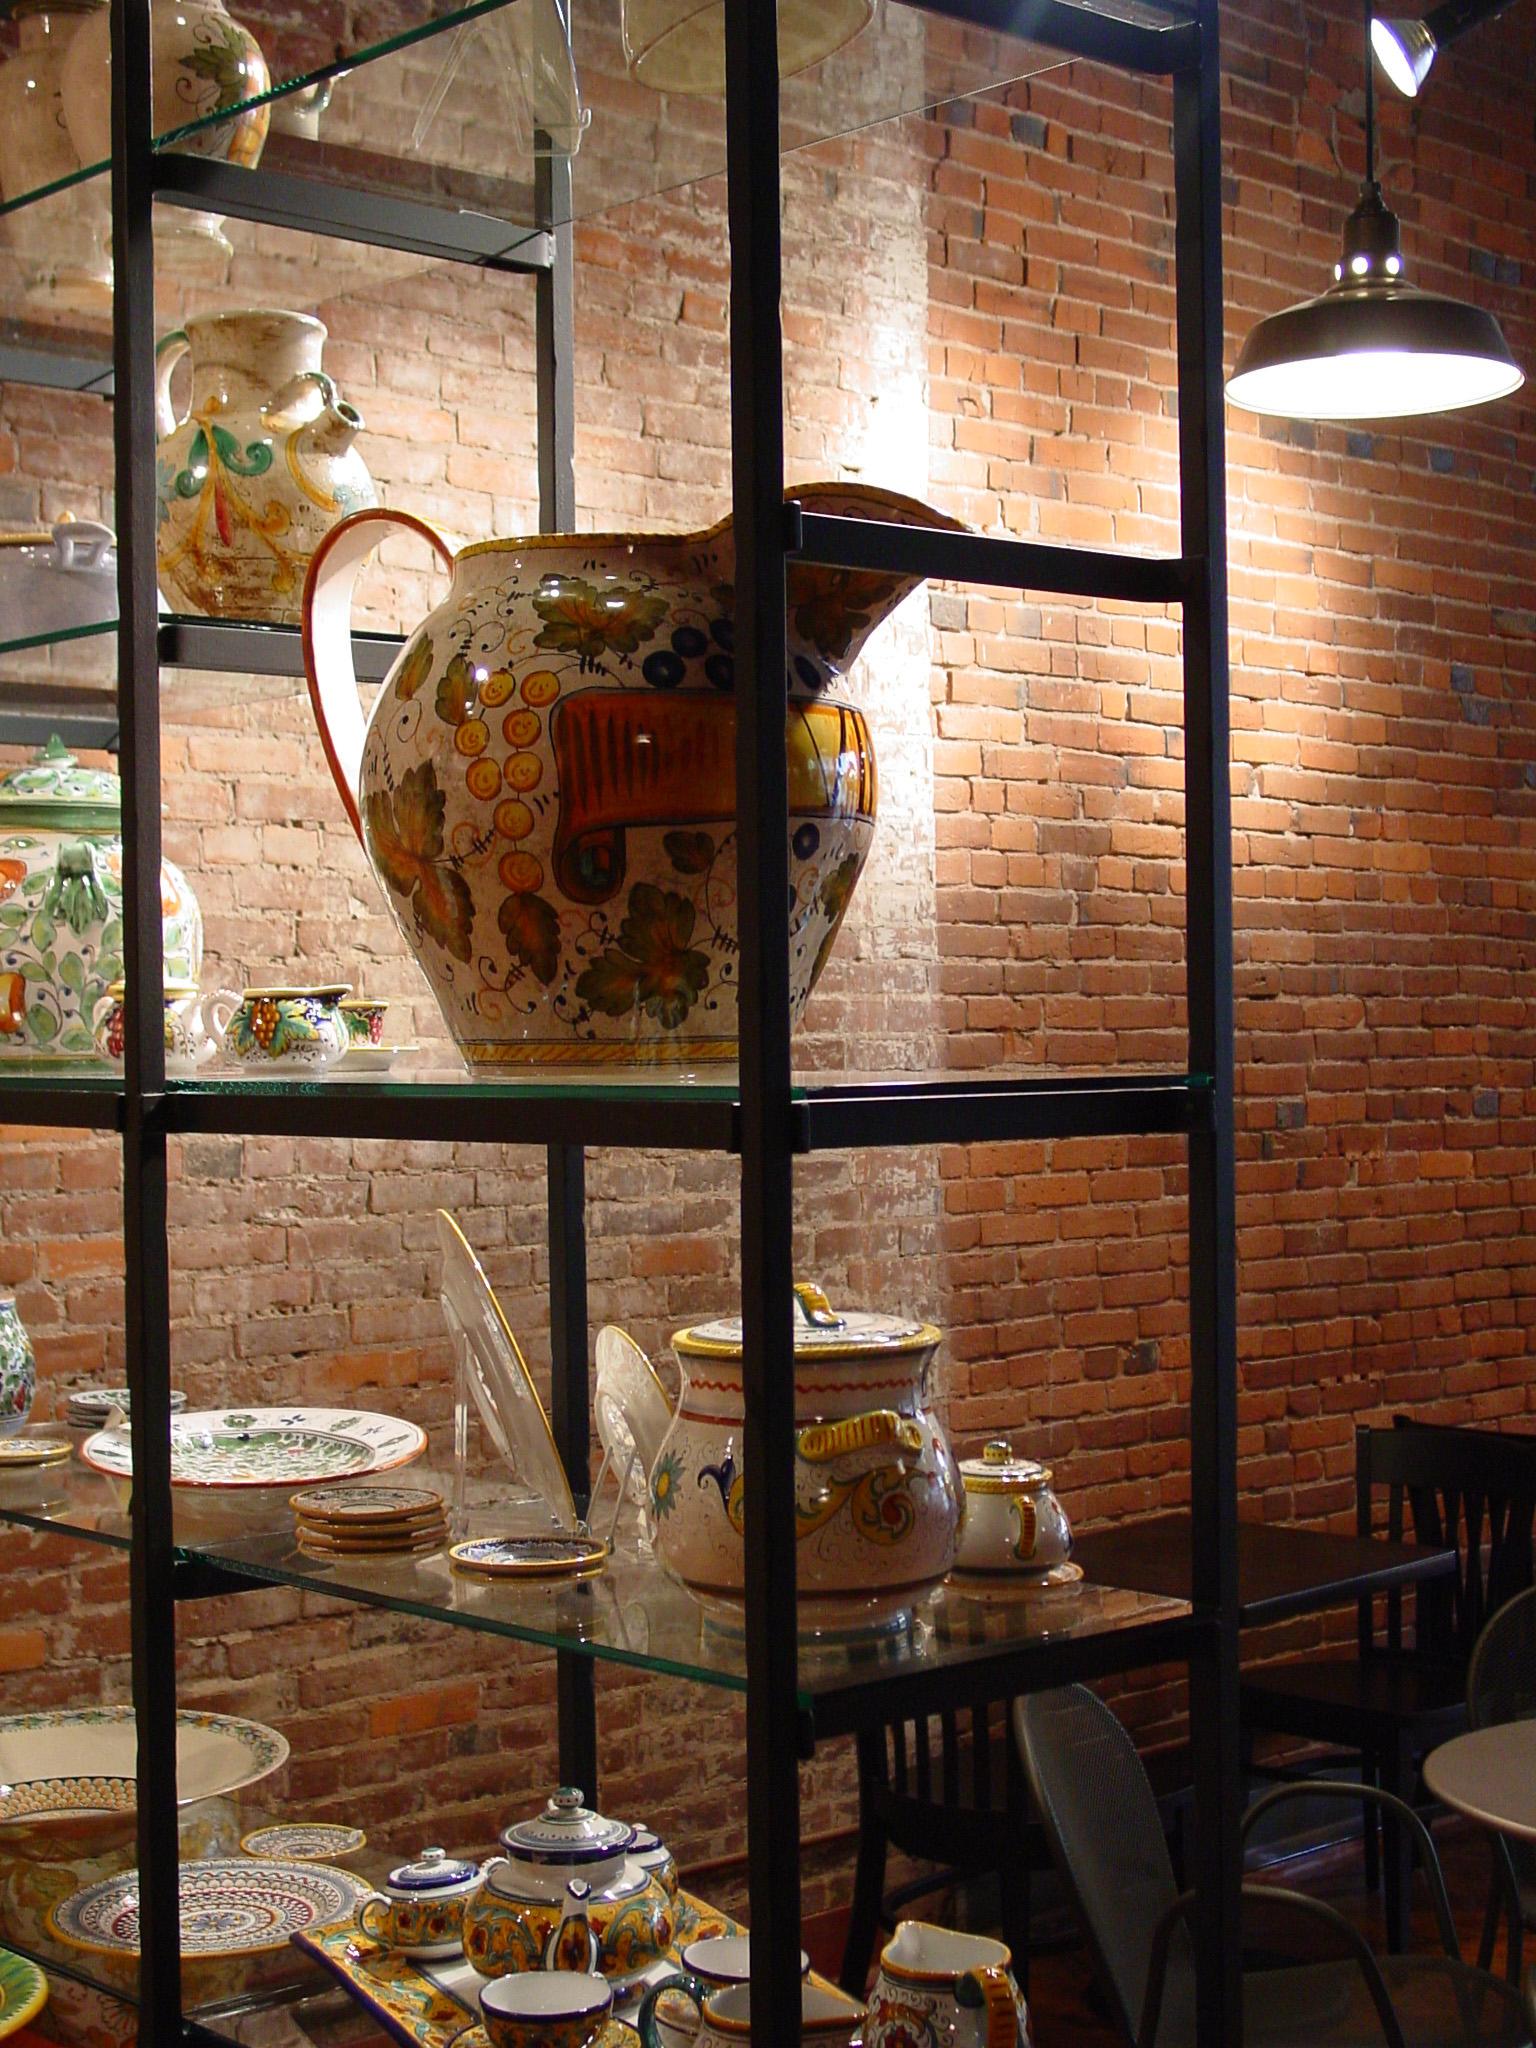 127_05_Perugino_vase.jpg